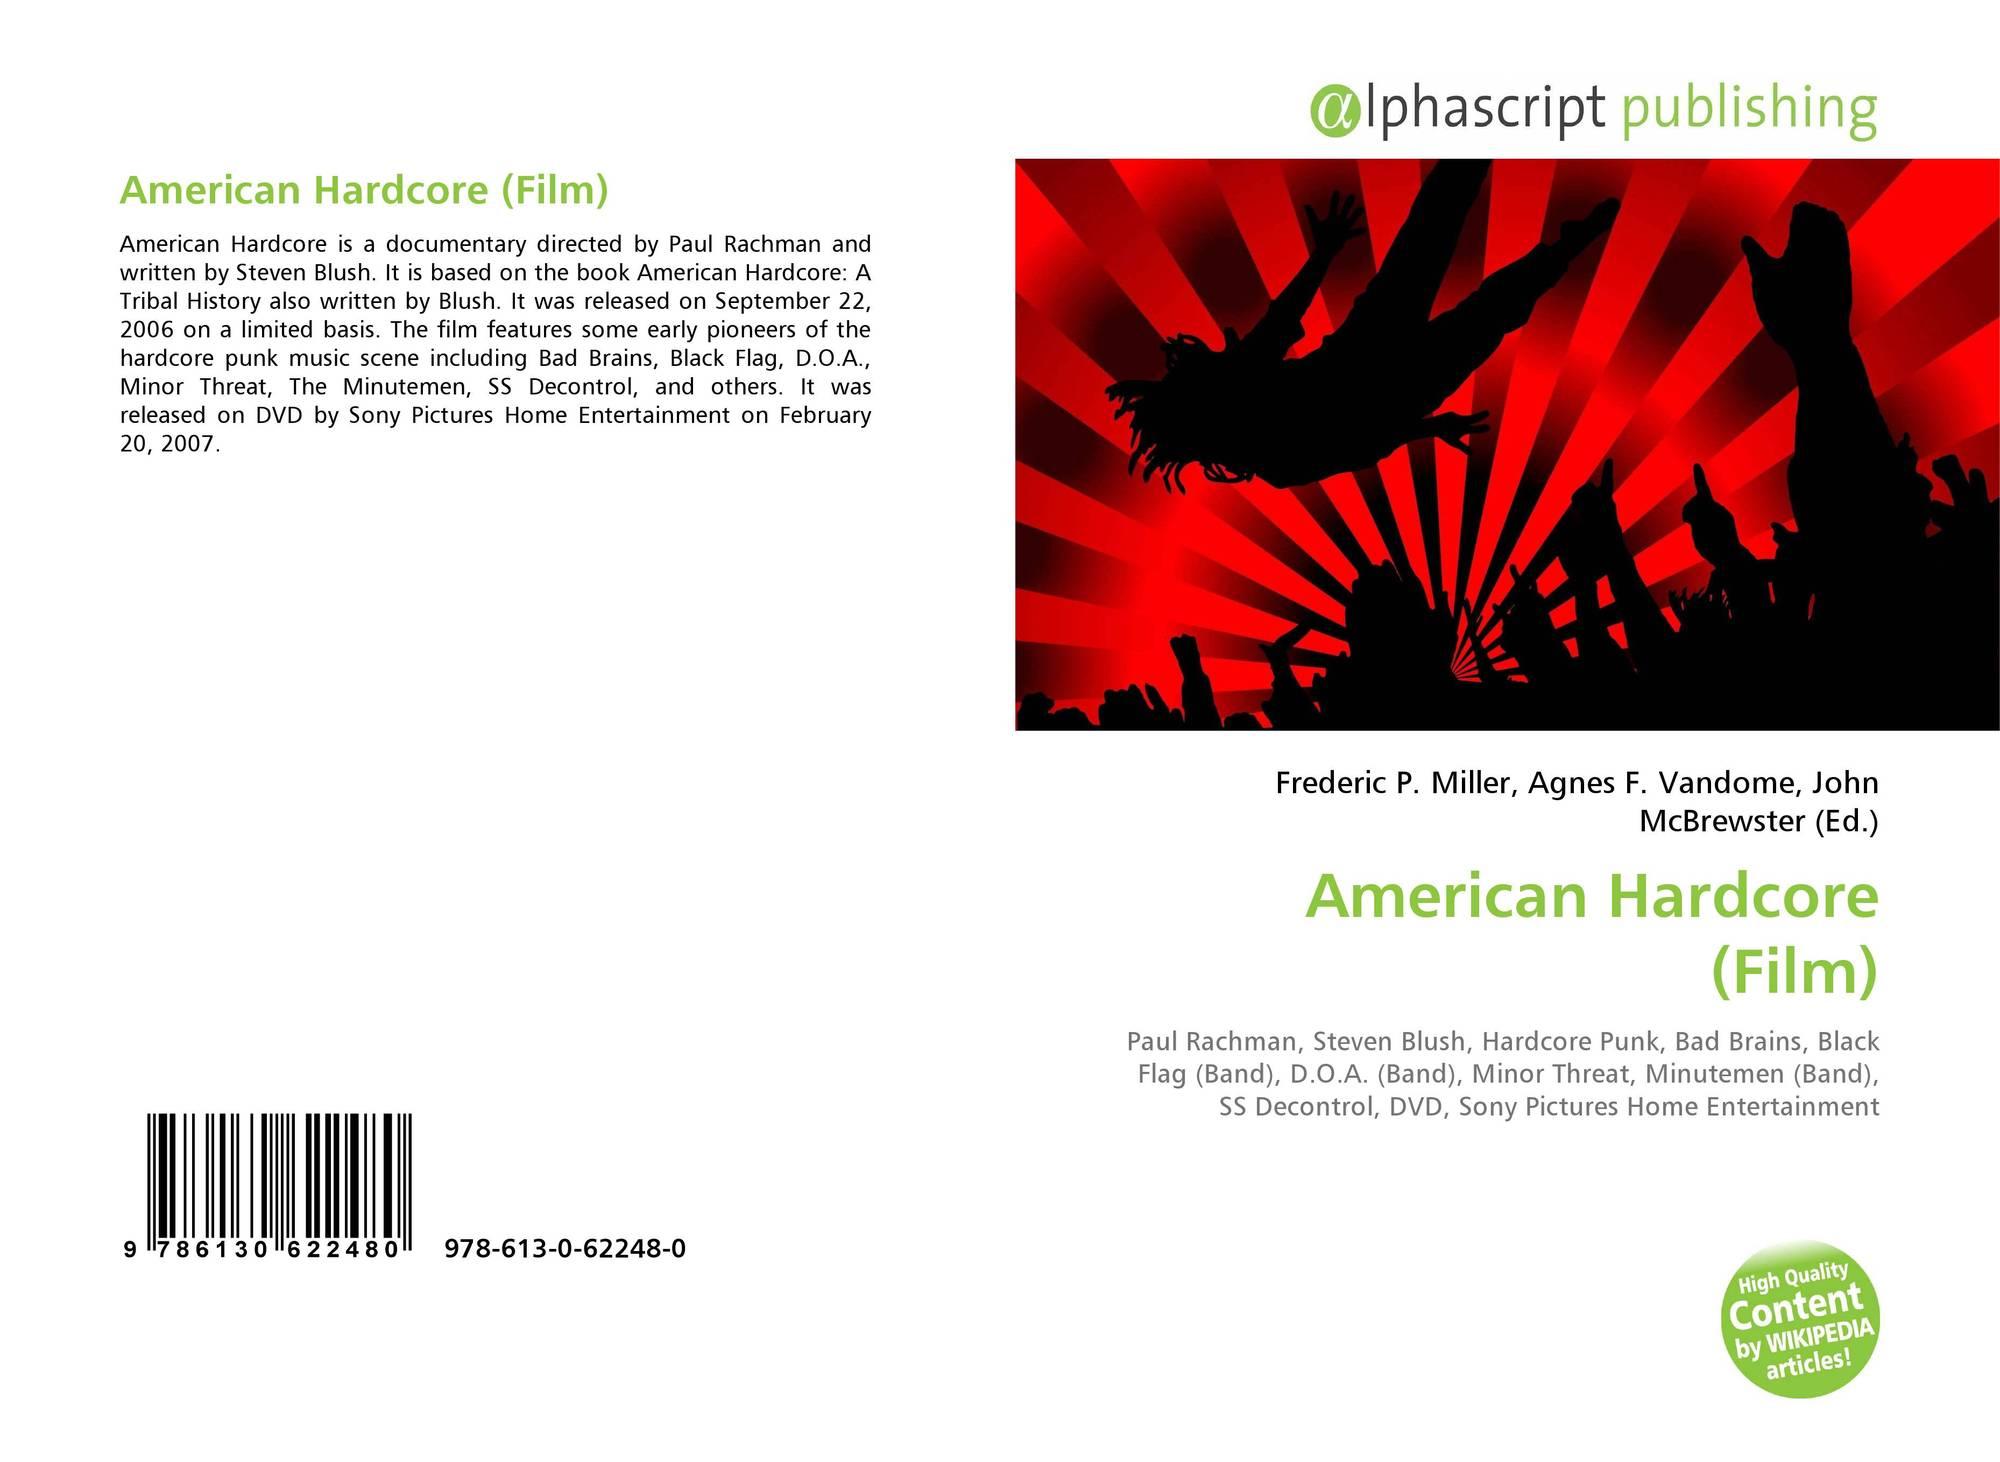 American Hardcore Film